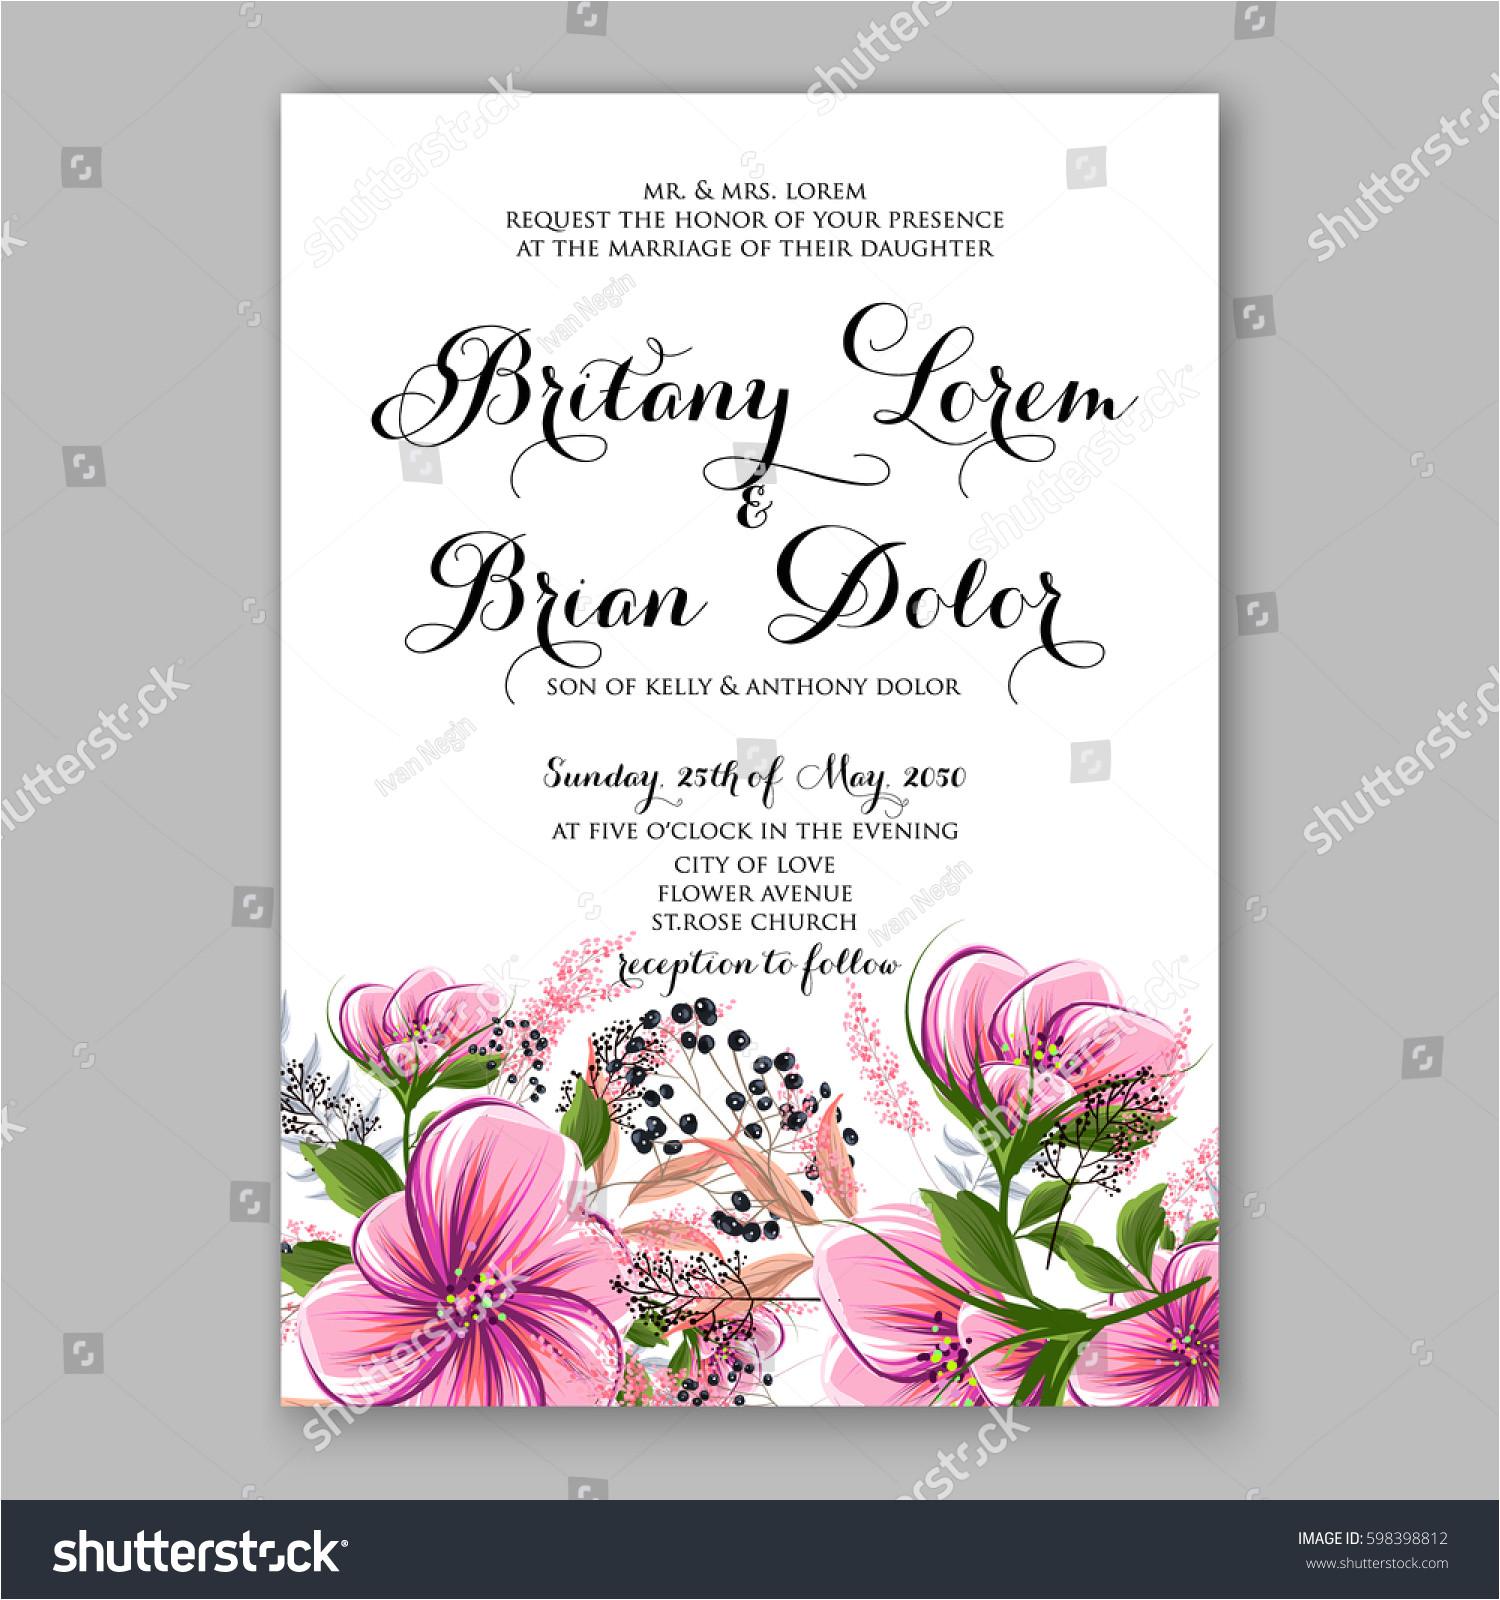 wedding invitation card template yellow rose 598398812 src 9 dyt8axlf3oeby ldzdxw 1 87